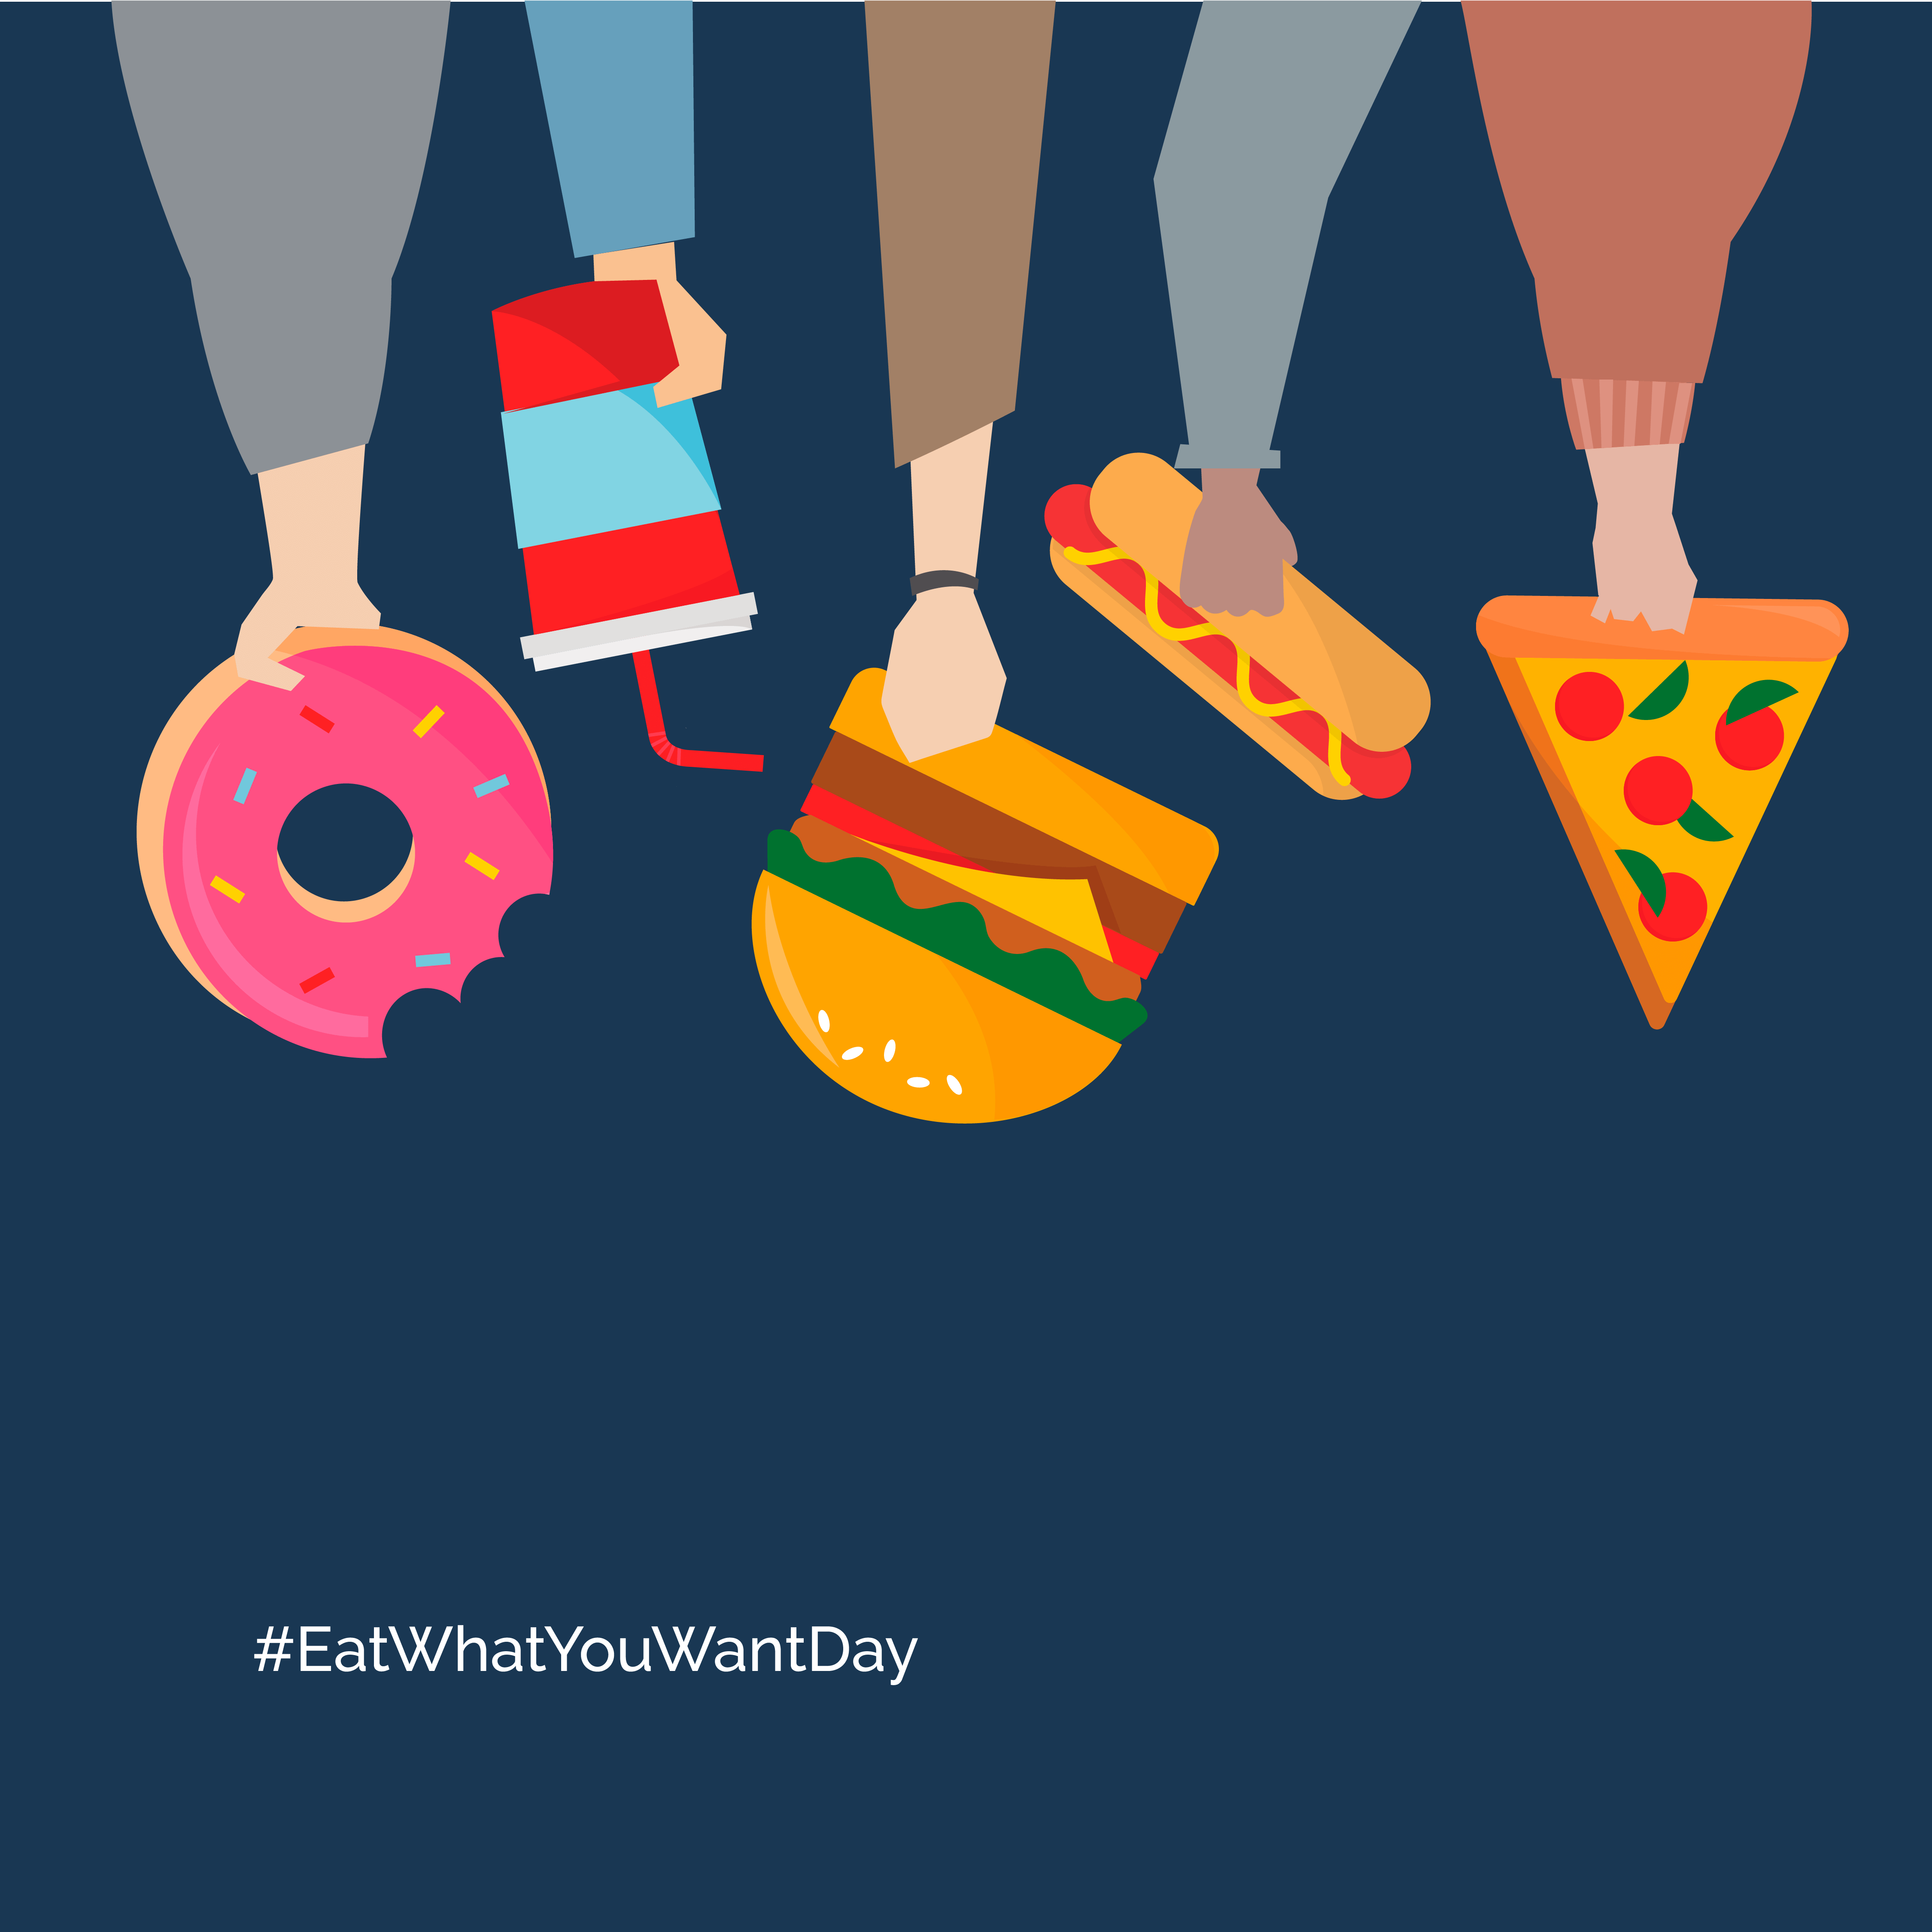 EatWhatYouWantDay